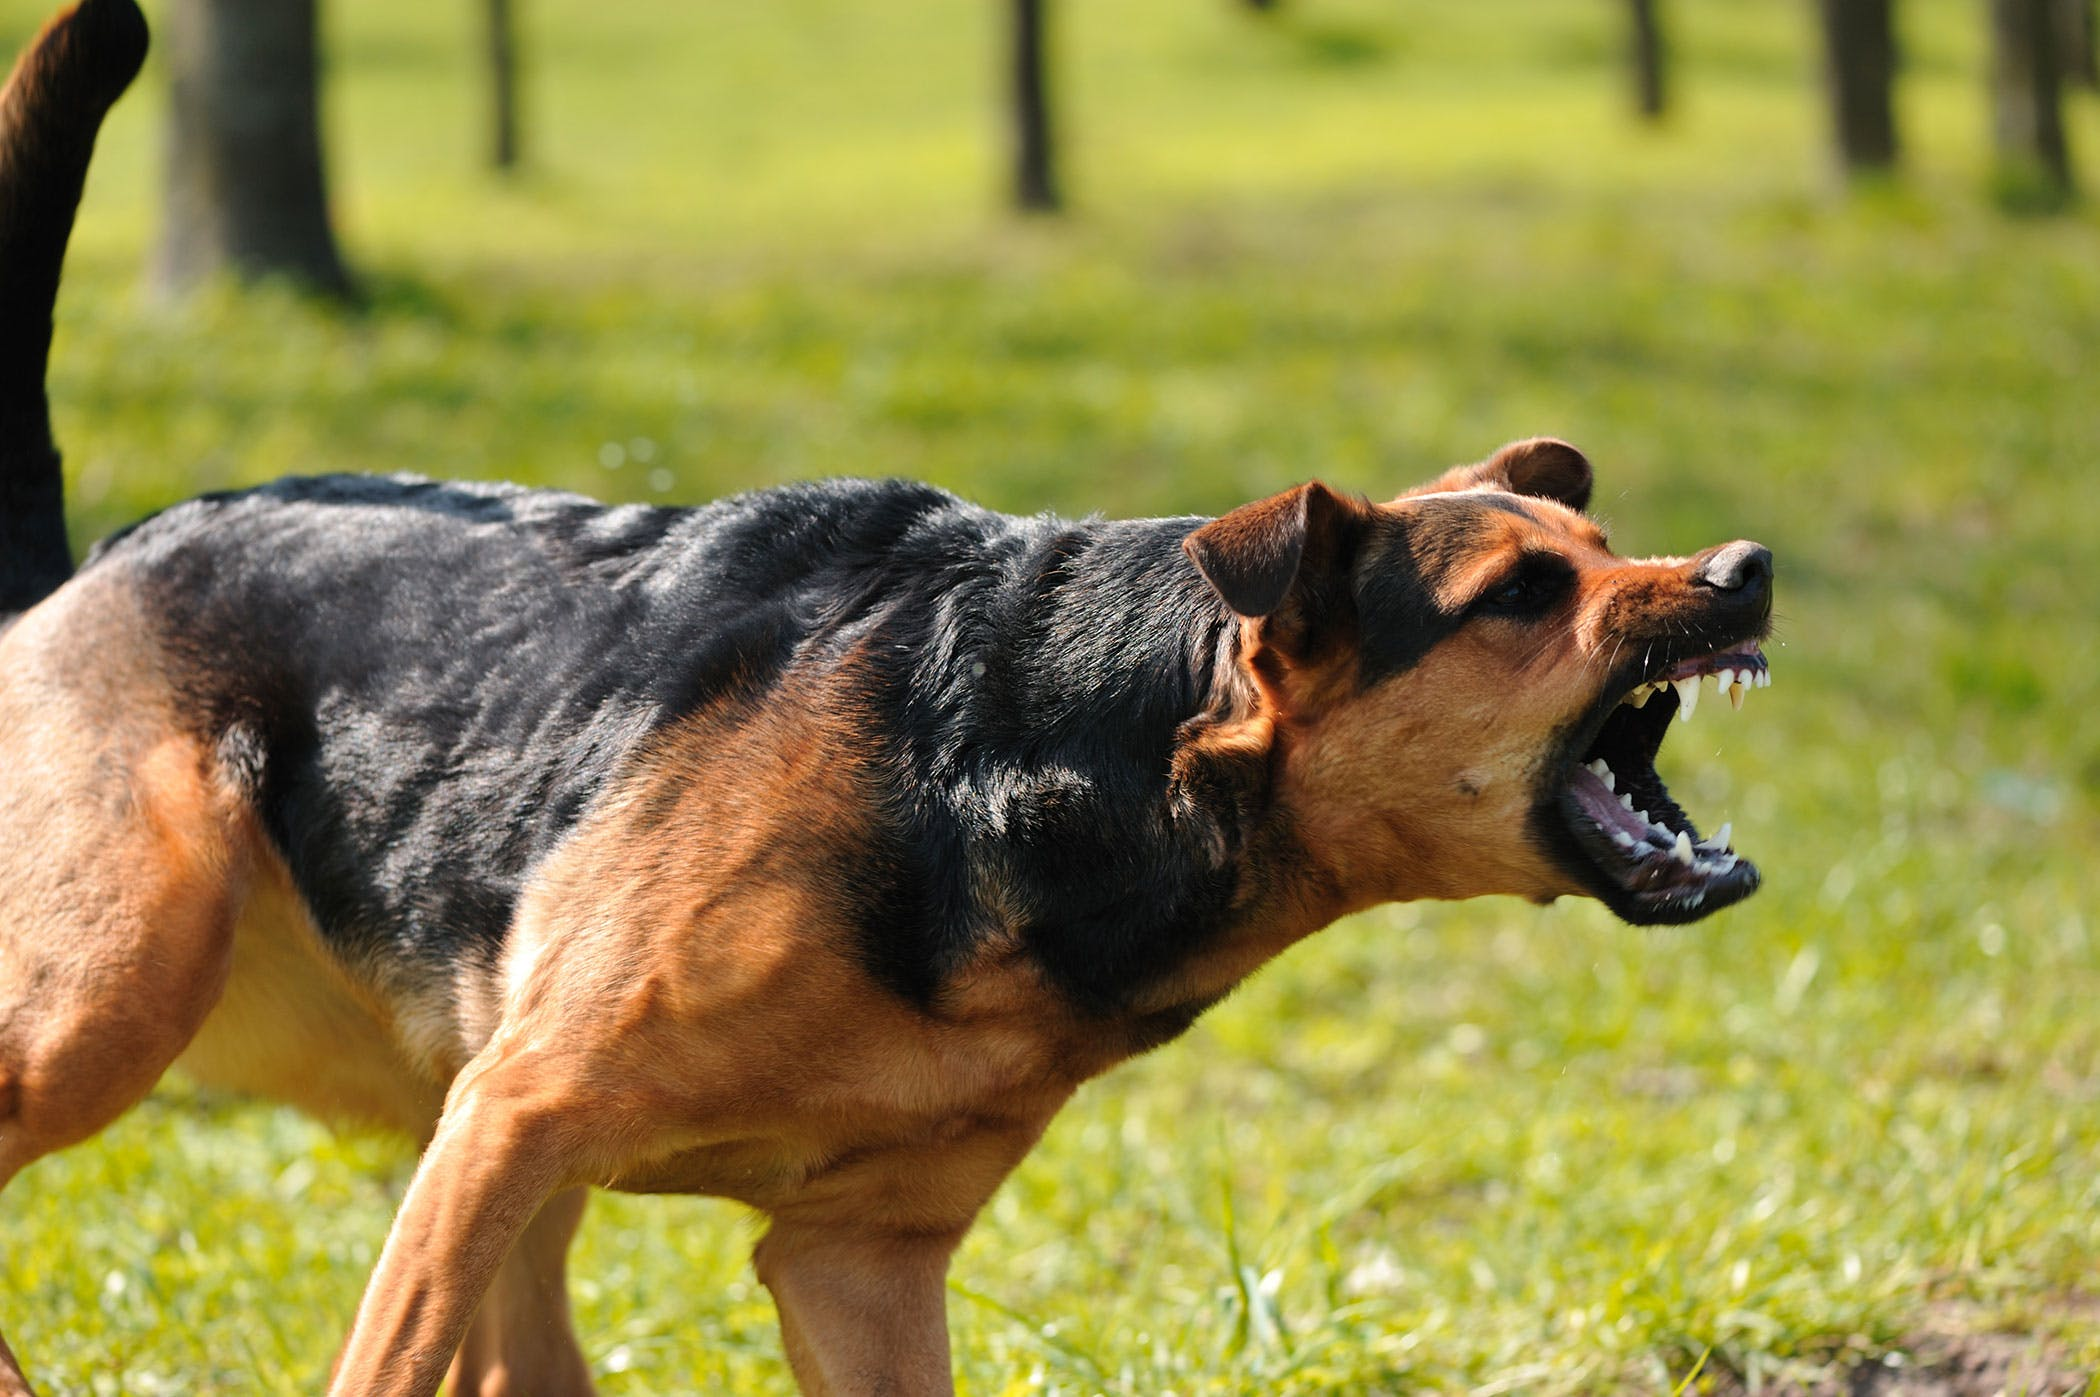 Dog Growling and Biting